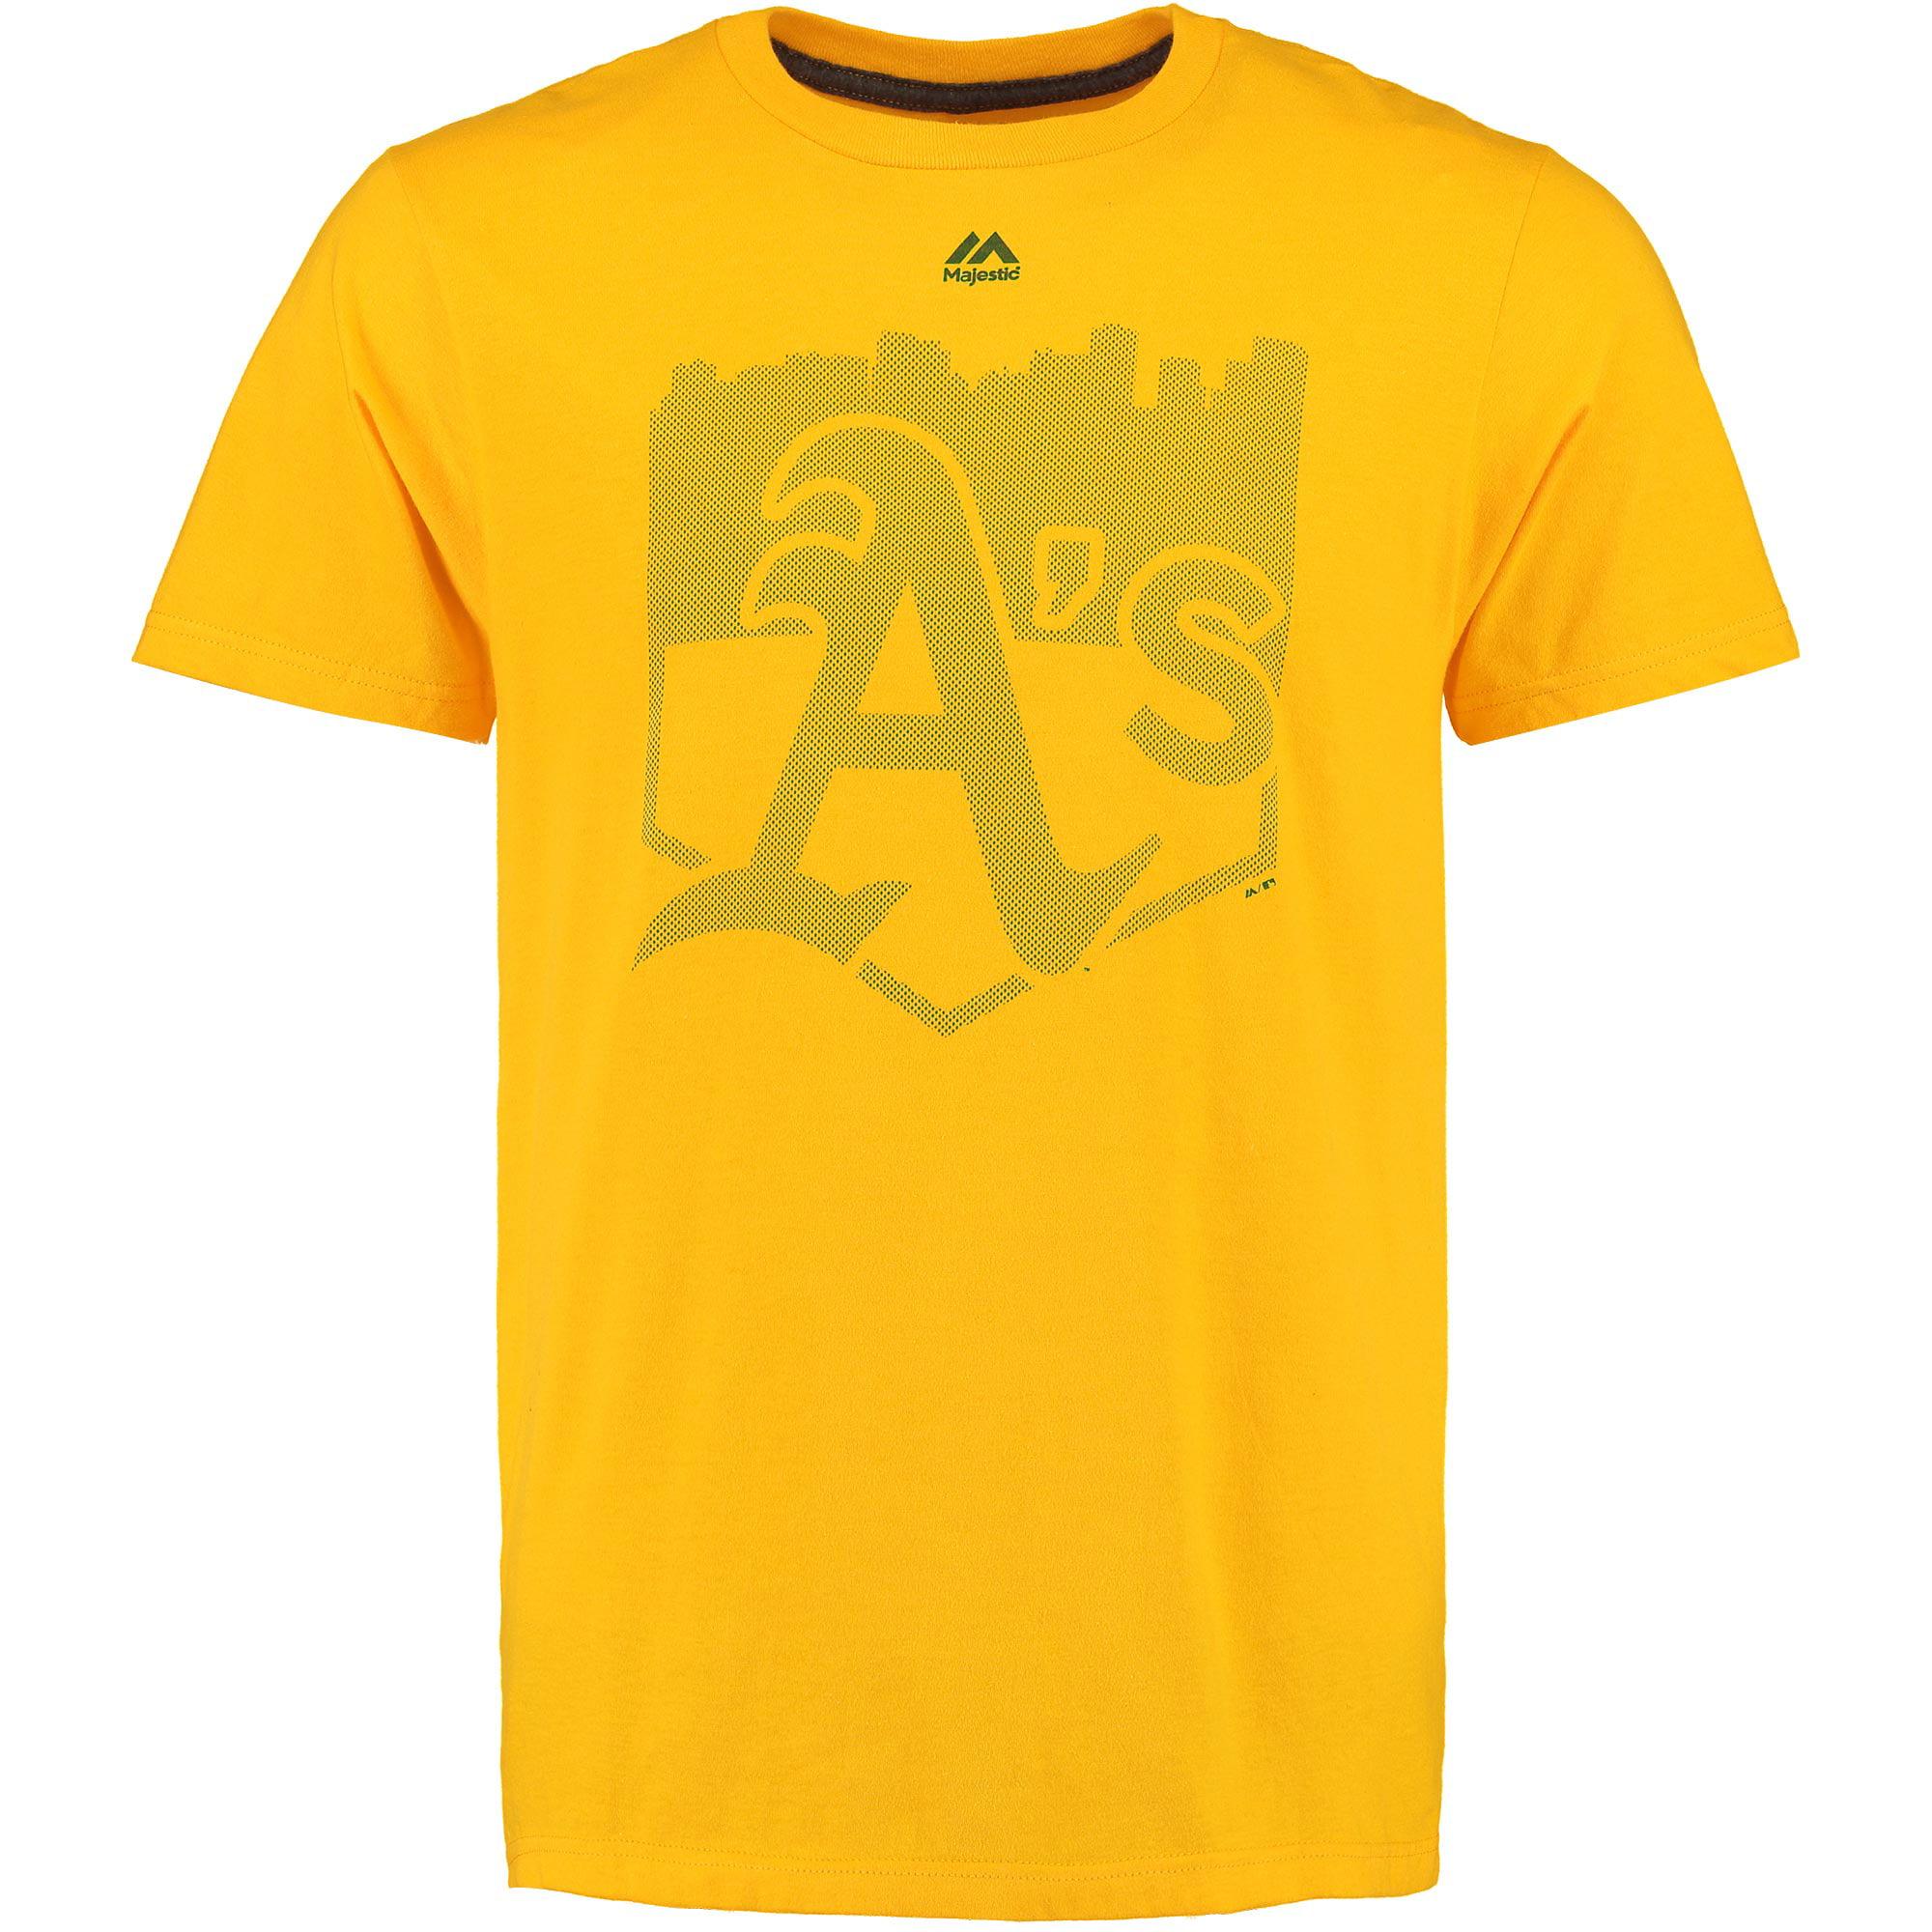 Oakland Athletics Majestic Pass Through T-Shirt - Yellow